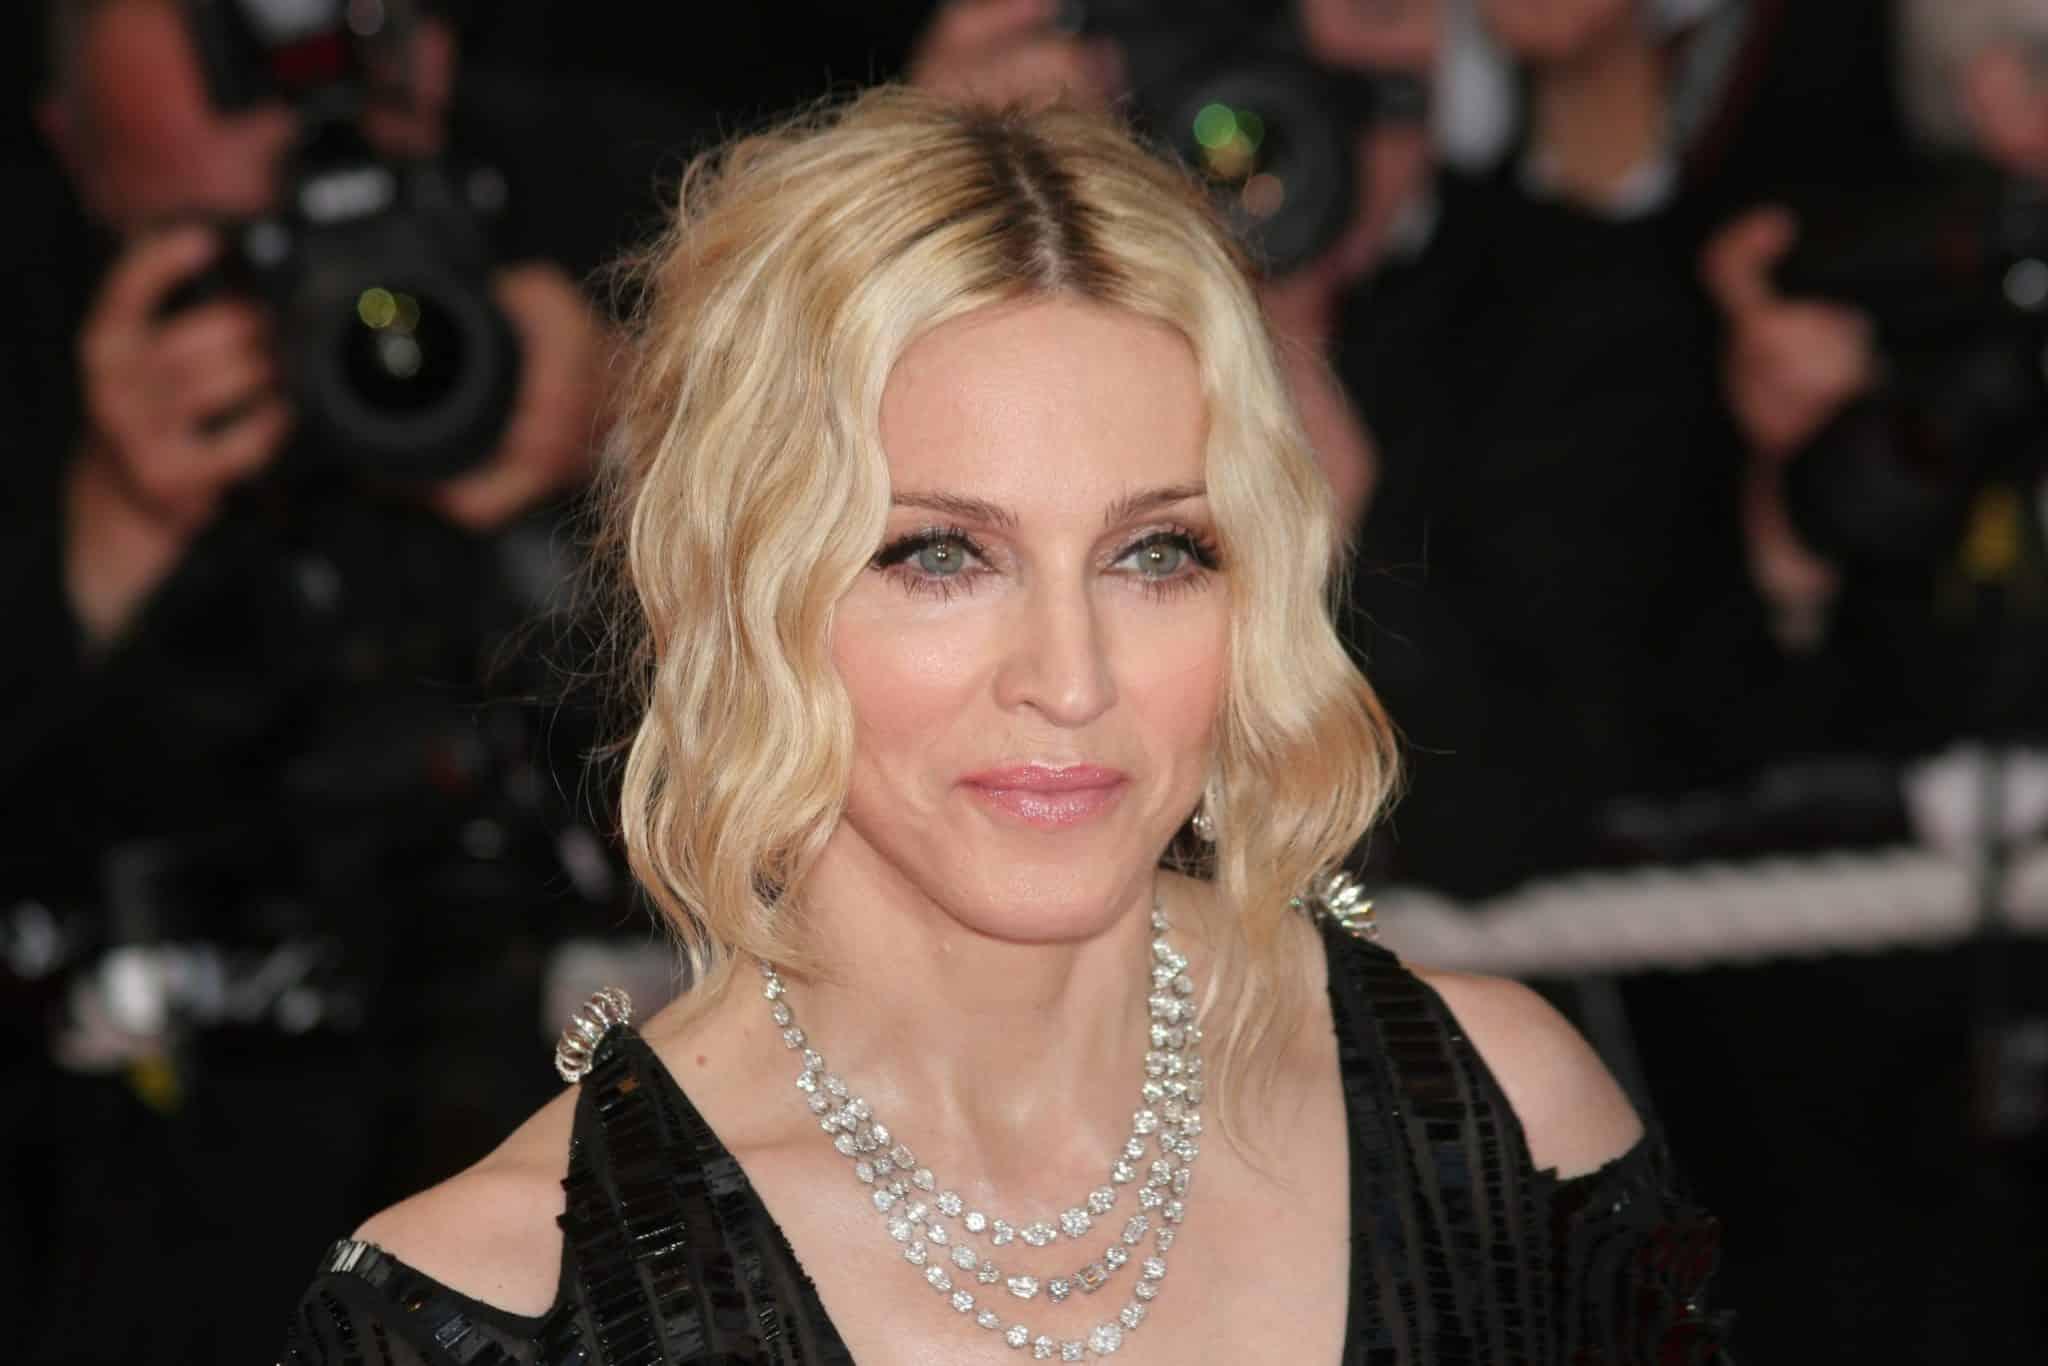 Madonna (Photo: Denis Makarenko/Shutterstock.com)